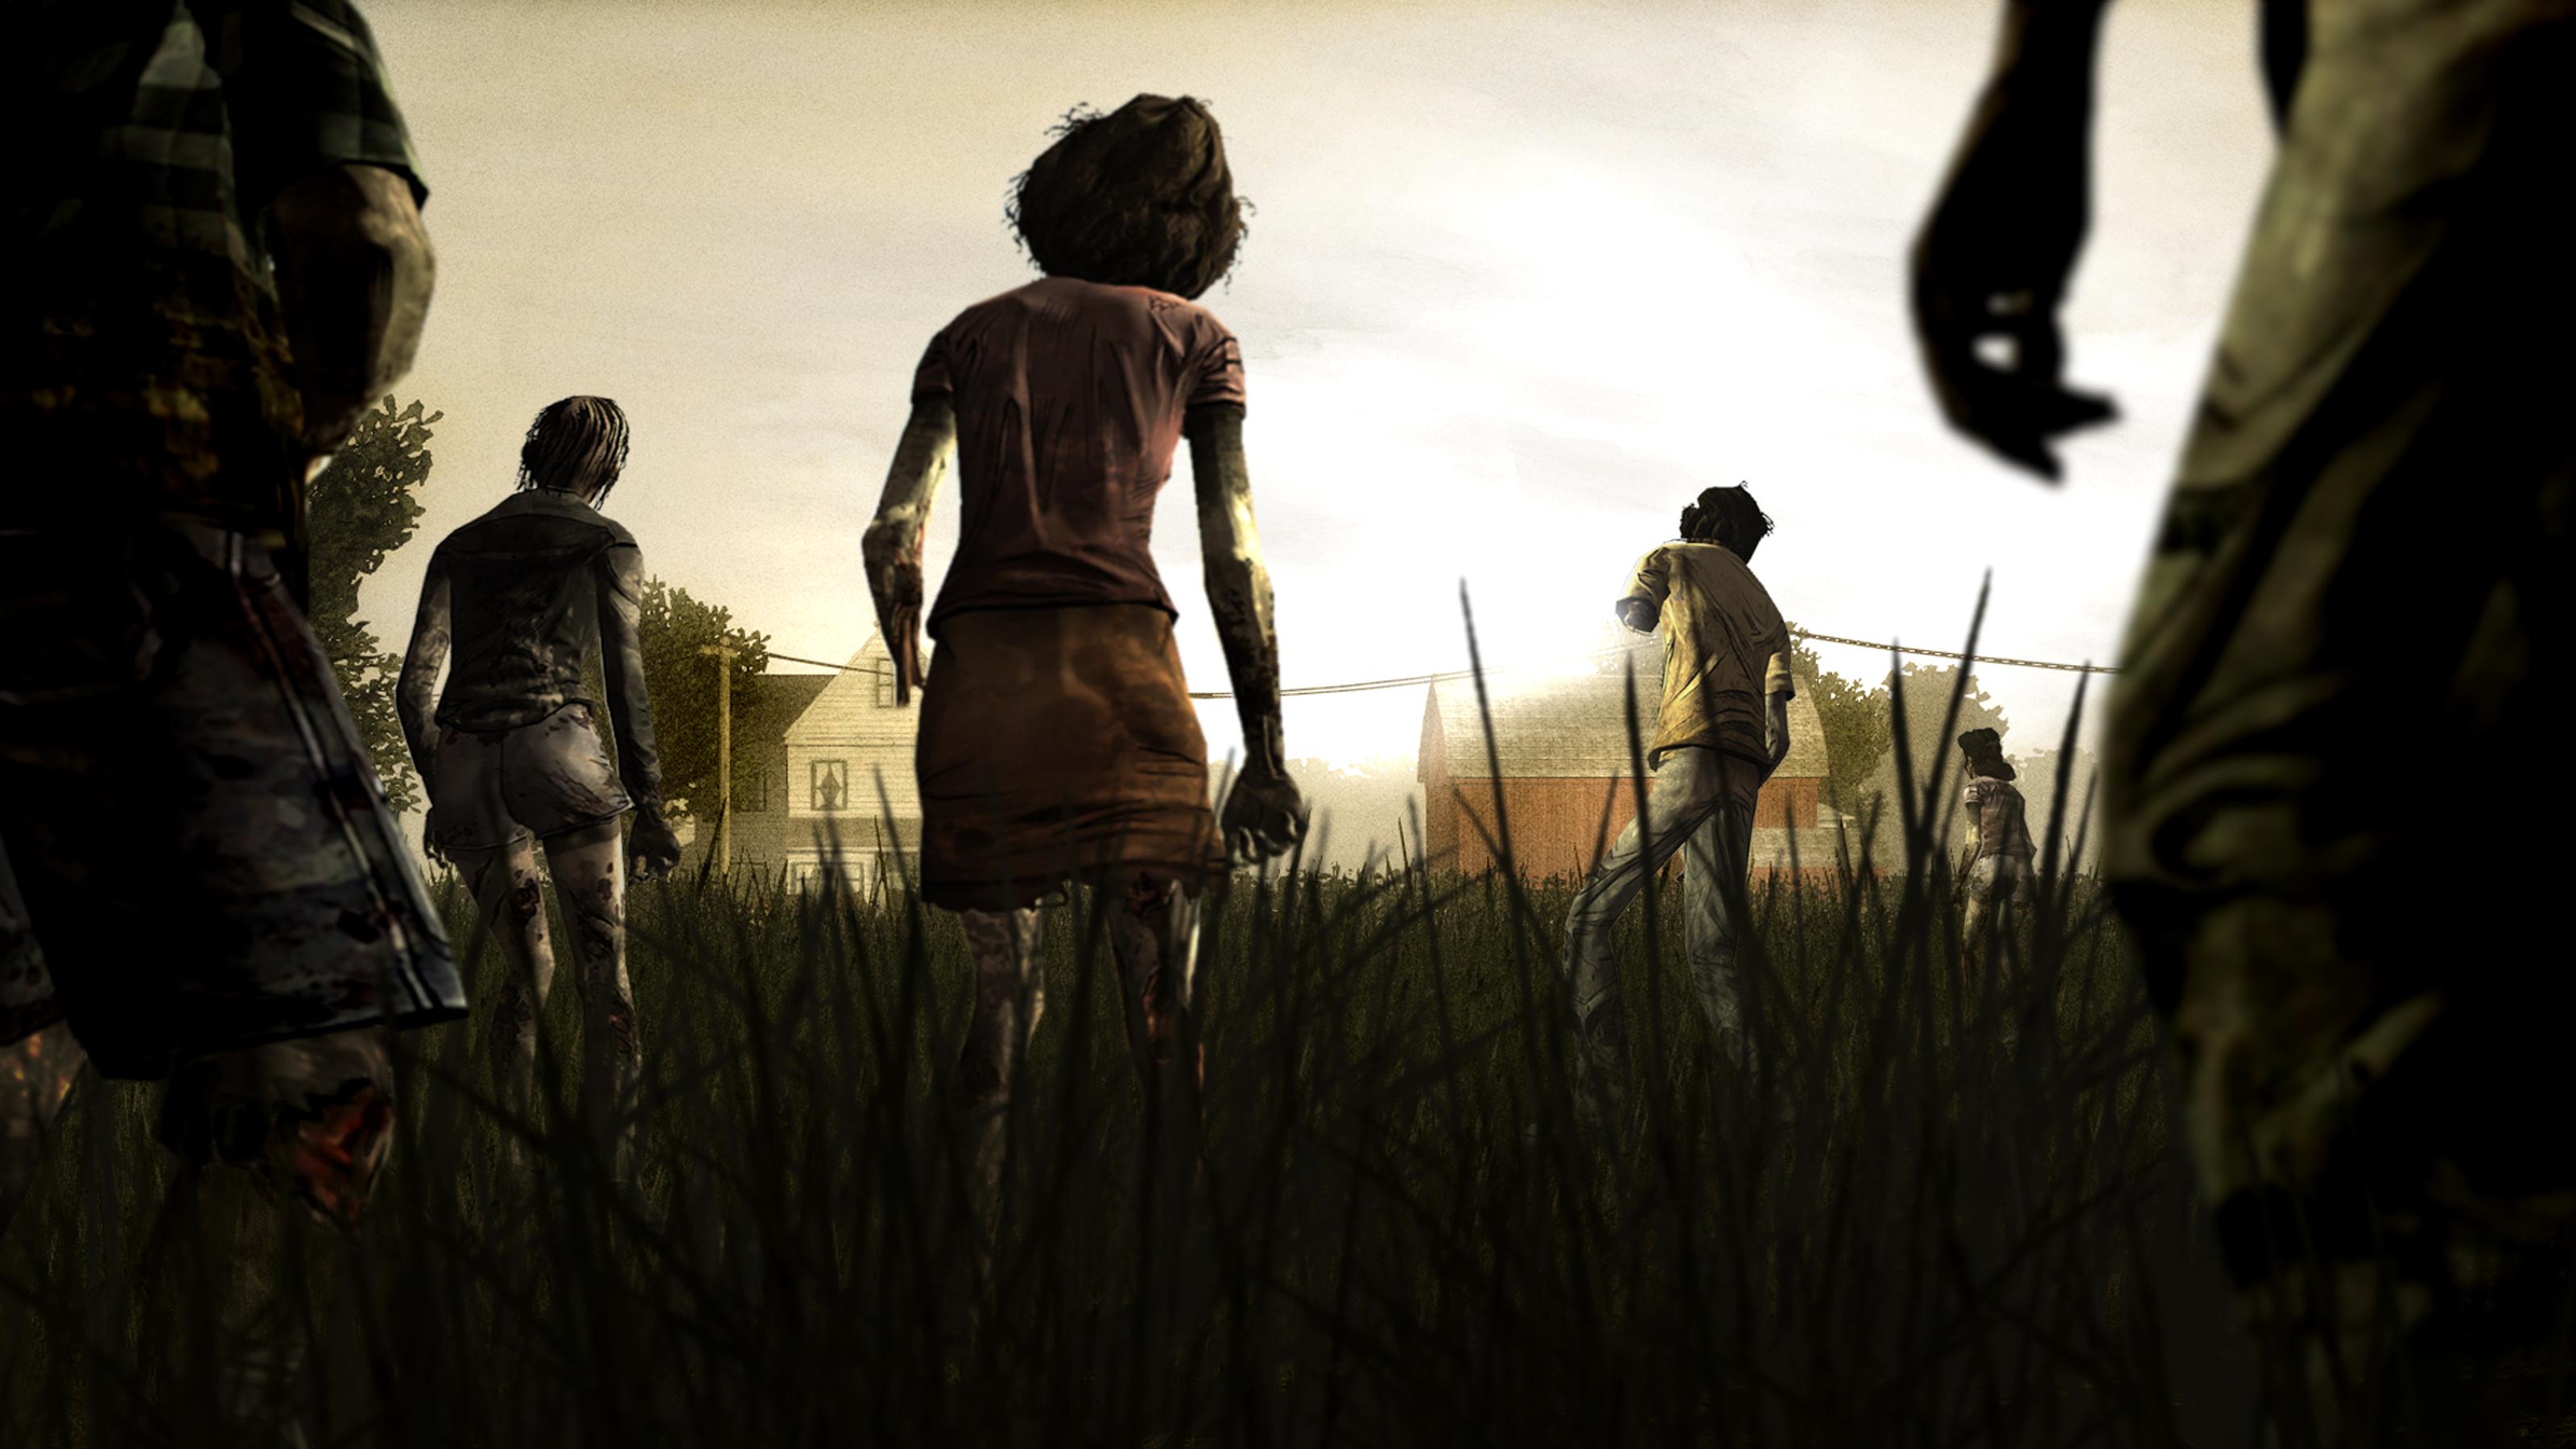 zombie The Walking Dead game wallpaper is a hi res Wallpaper 3200x1800